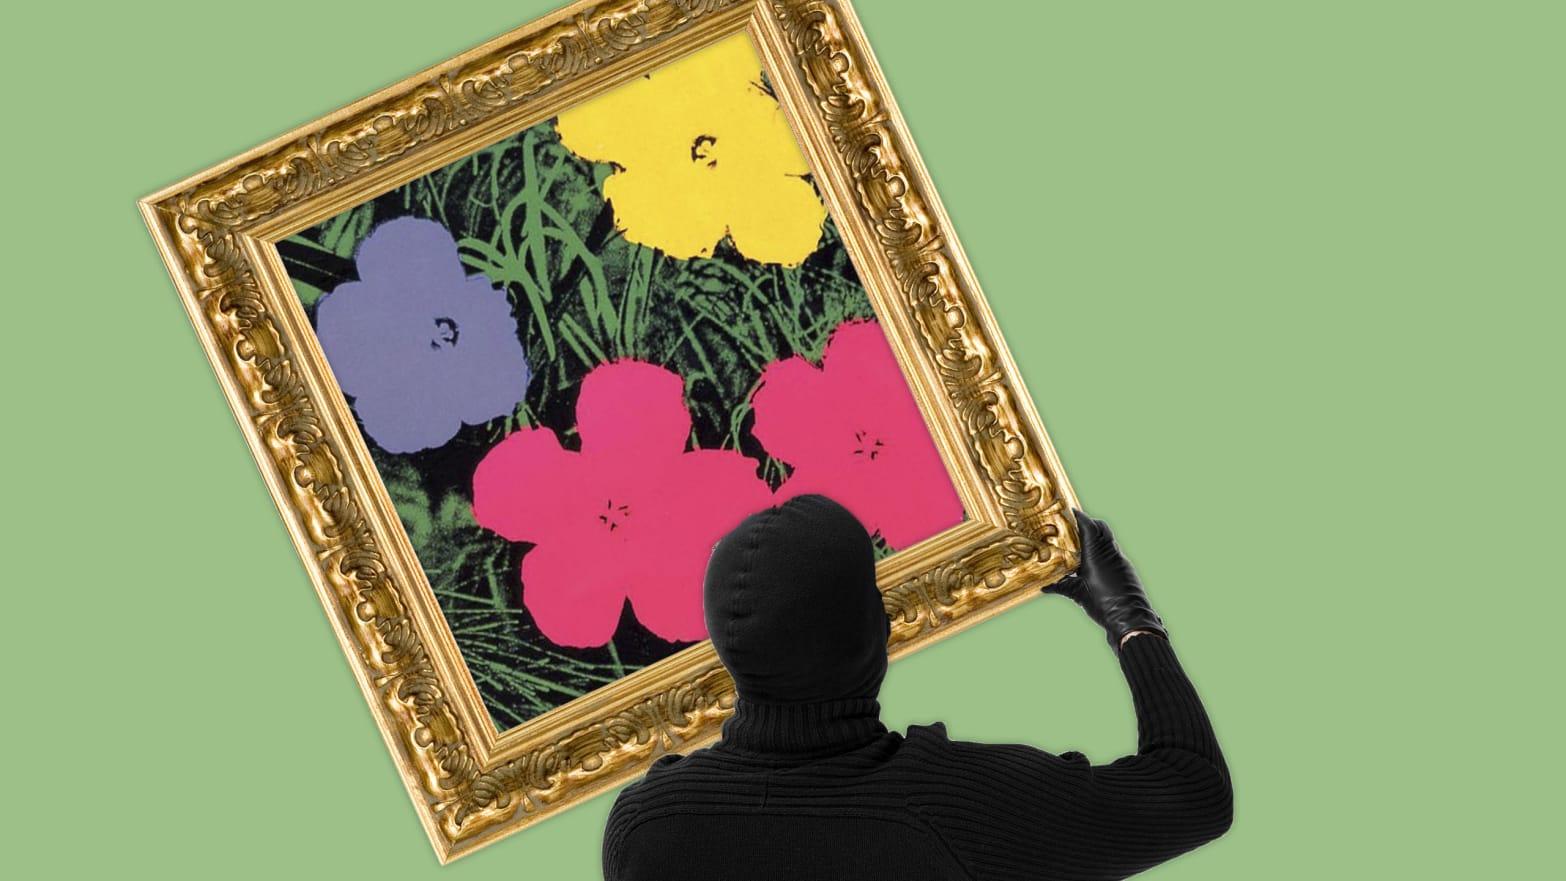 colori delicati lusso imballaggio forte This Andy Warhol Artwork Was Stolen, and Never Seen Again